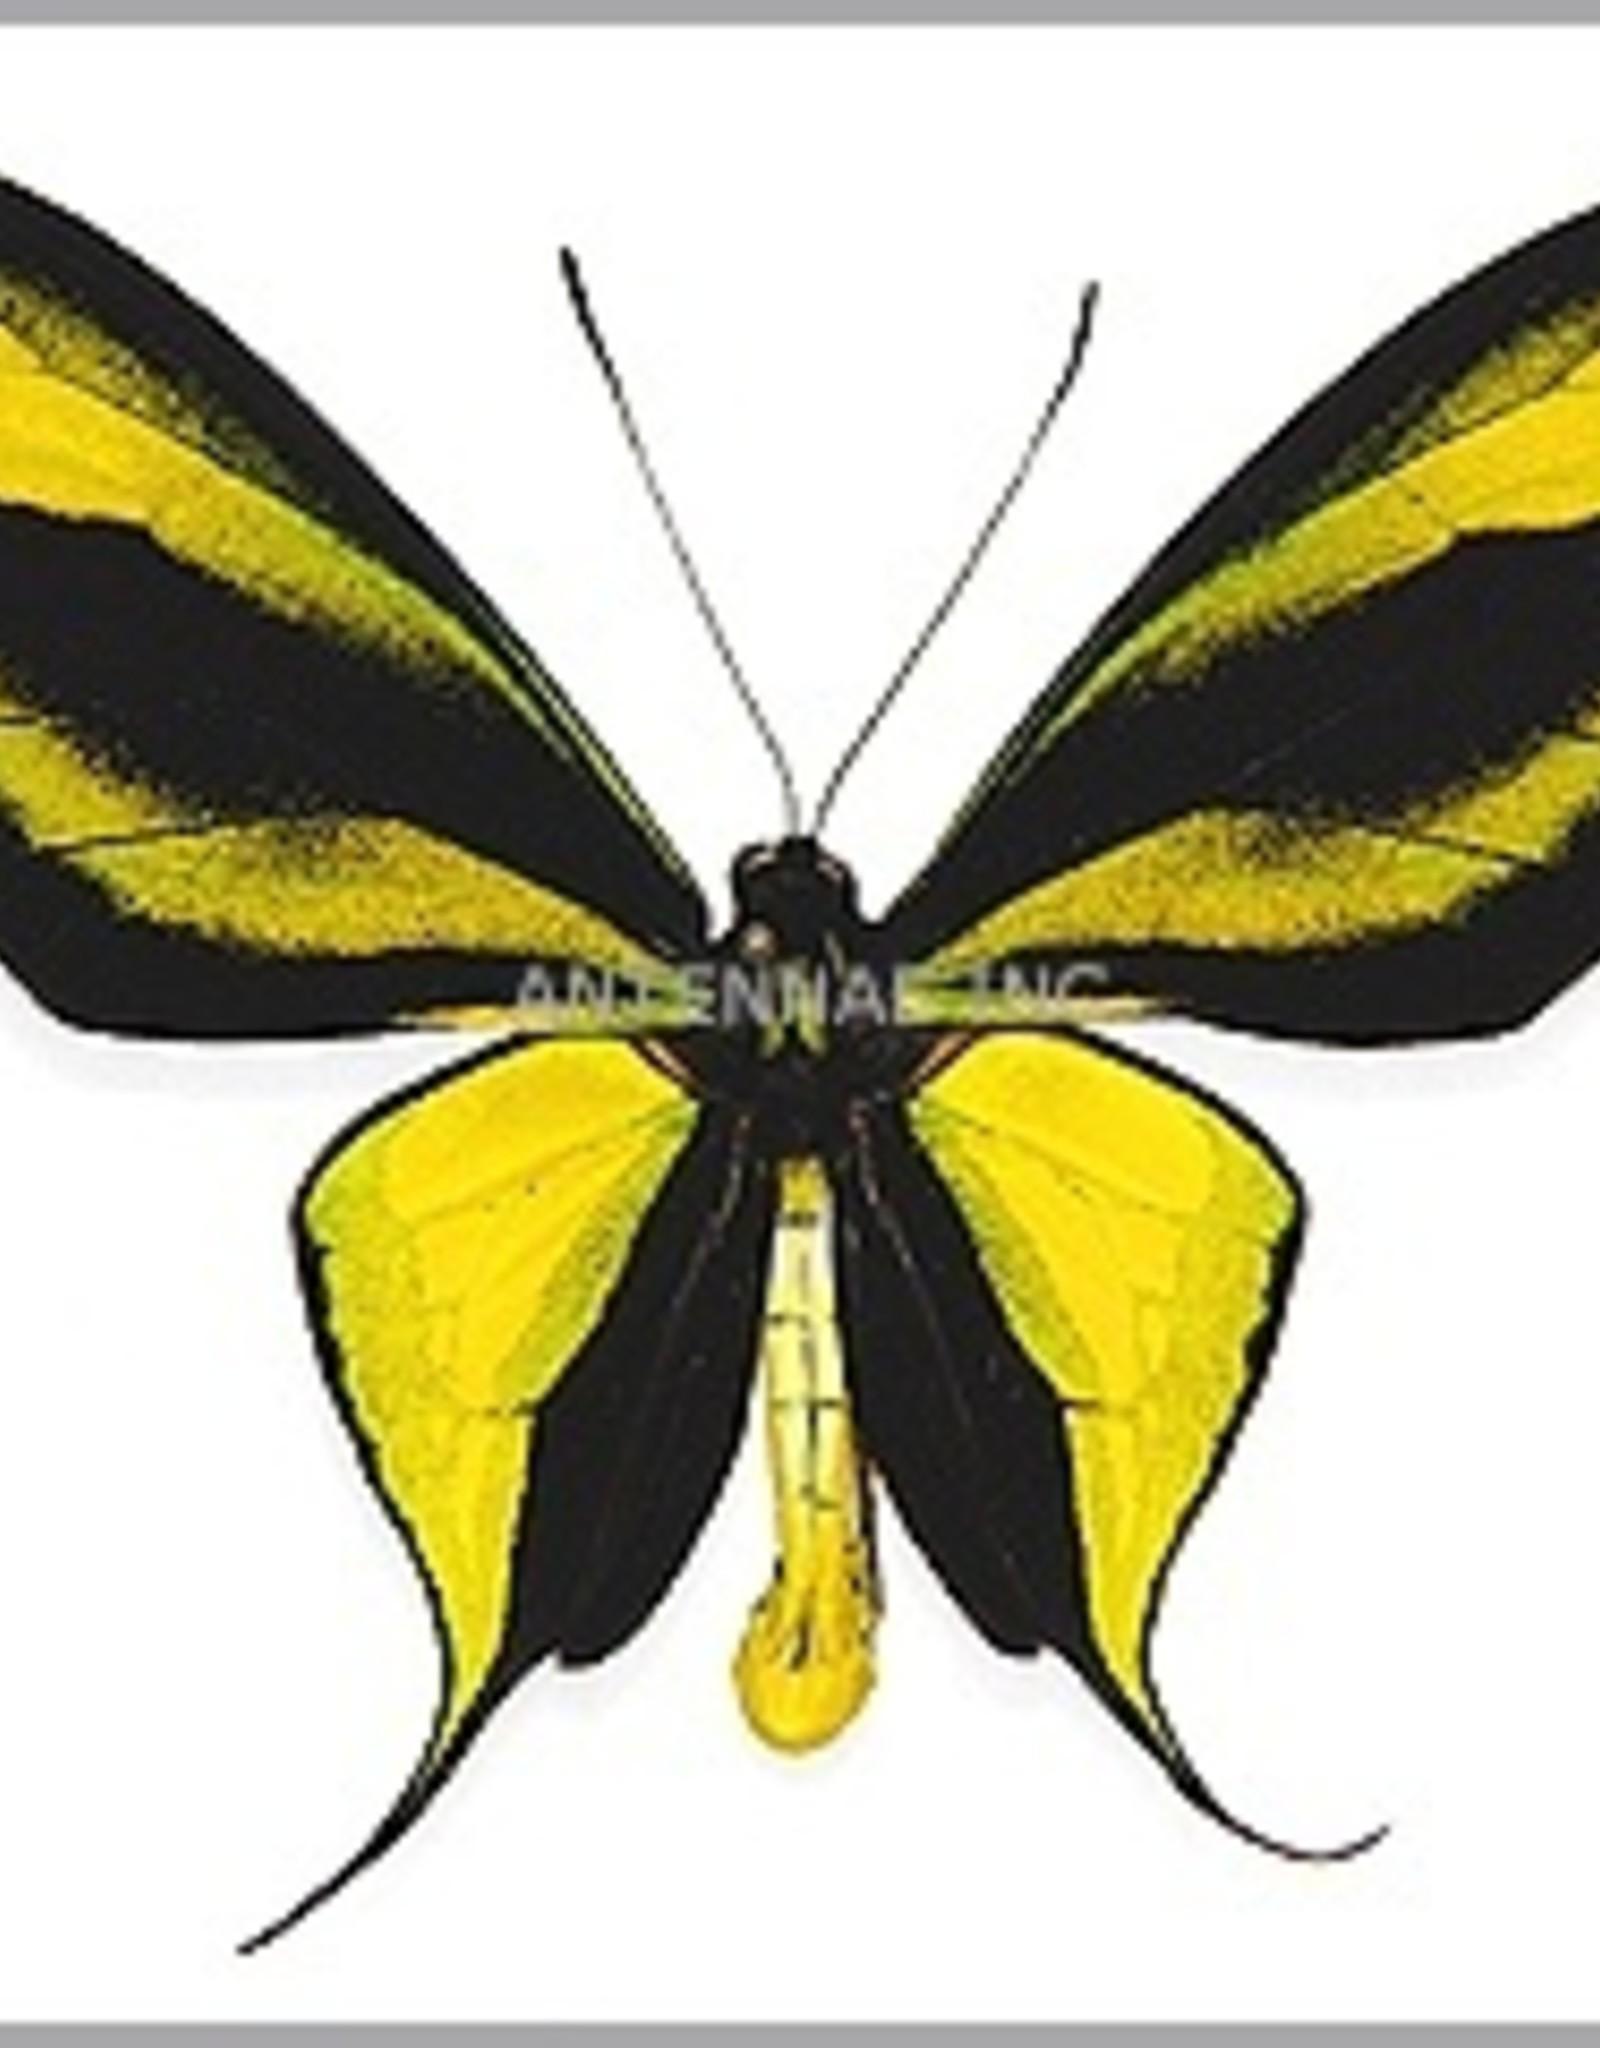 Ornithoptera paradisea arfakensis PAIR A1 Indonesia EXTRA LARGE >7.8cm